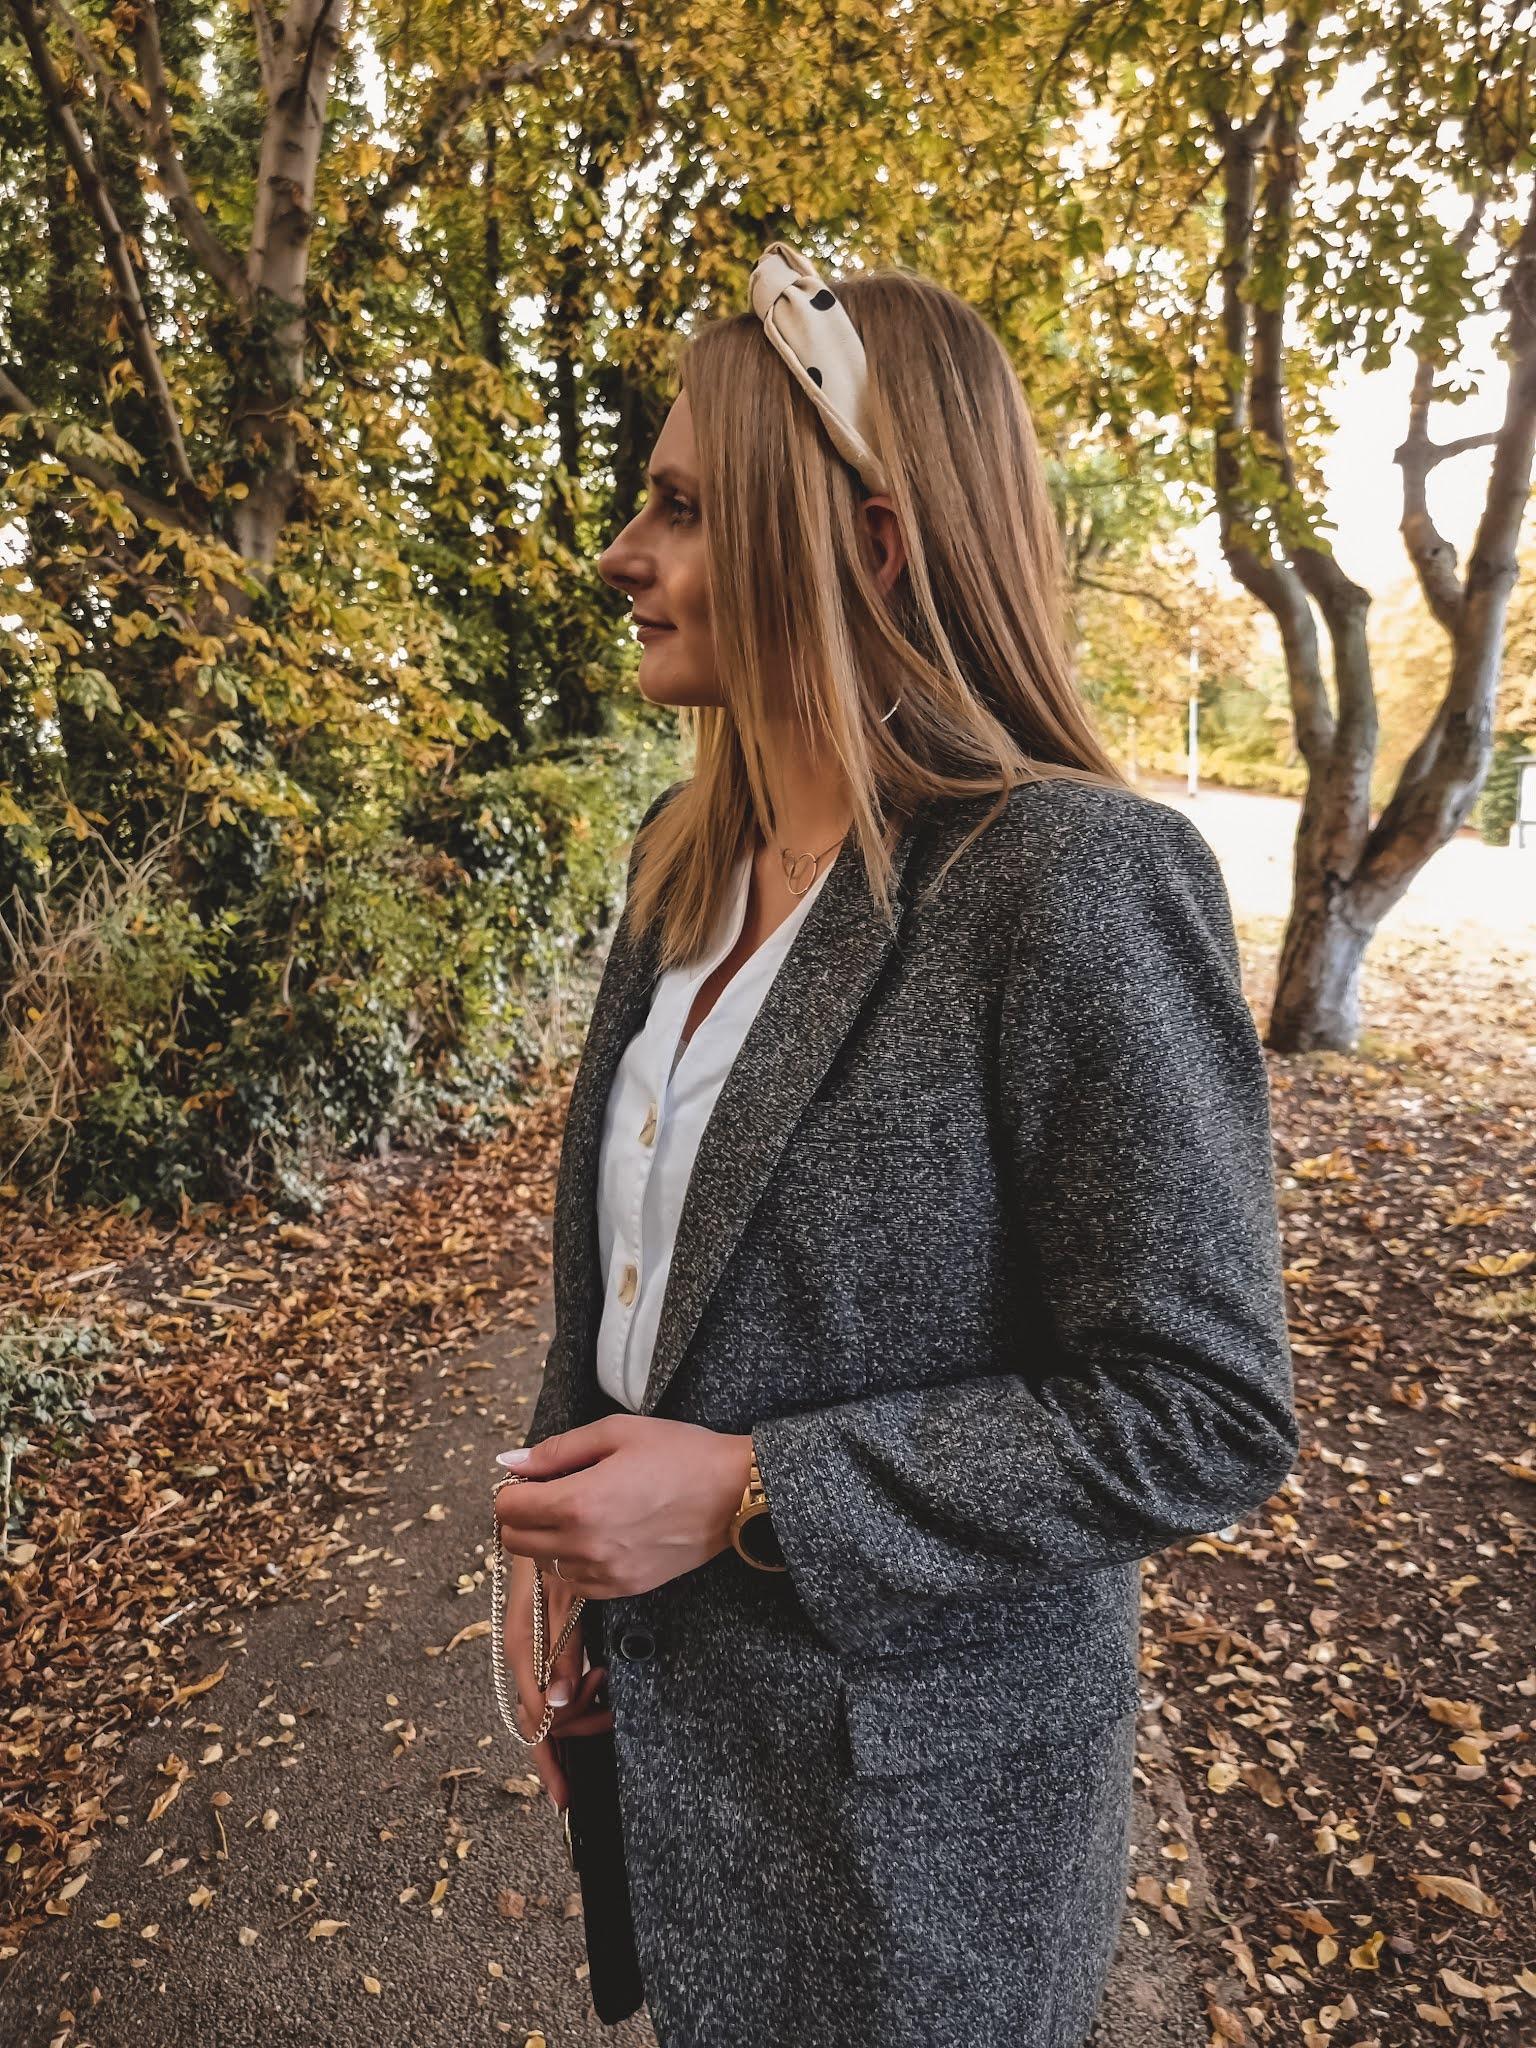 Autumn Shades of grey czyli mom jeans, marynarka i mokasyny